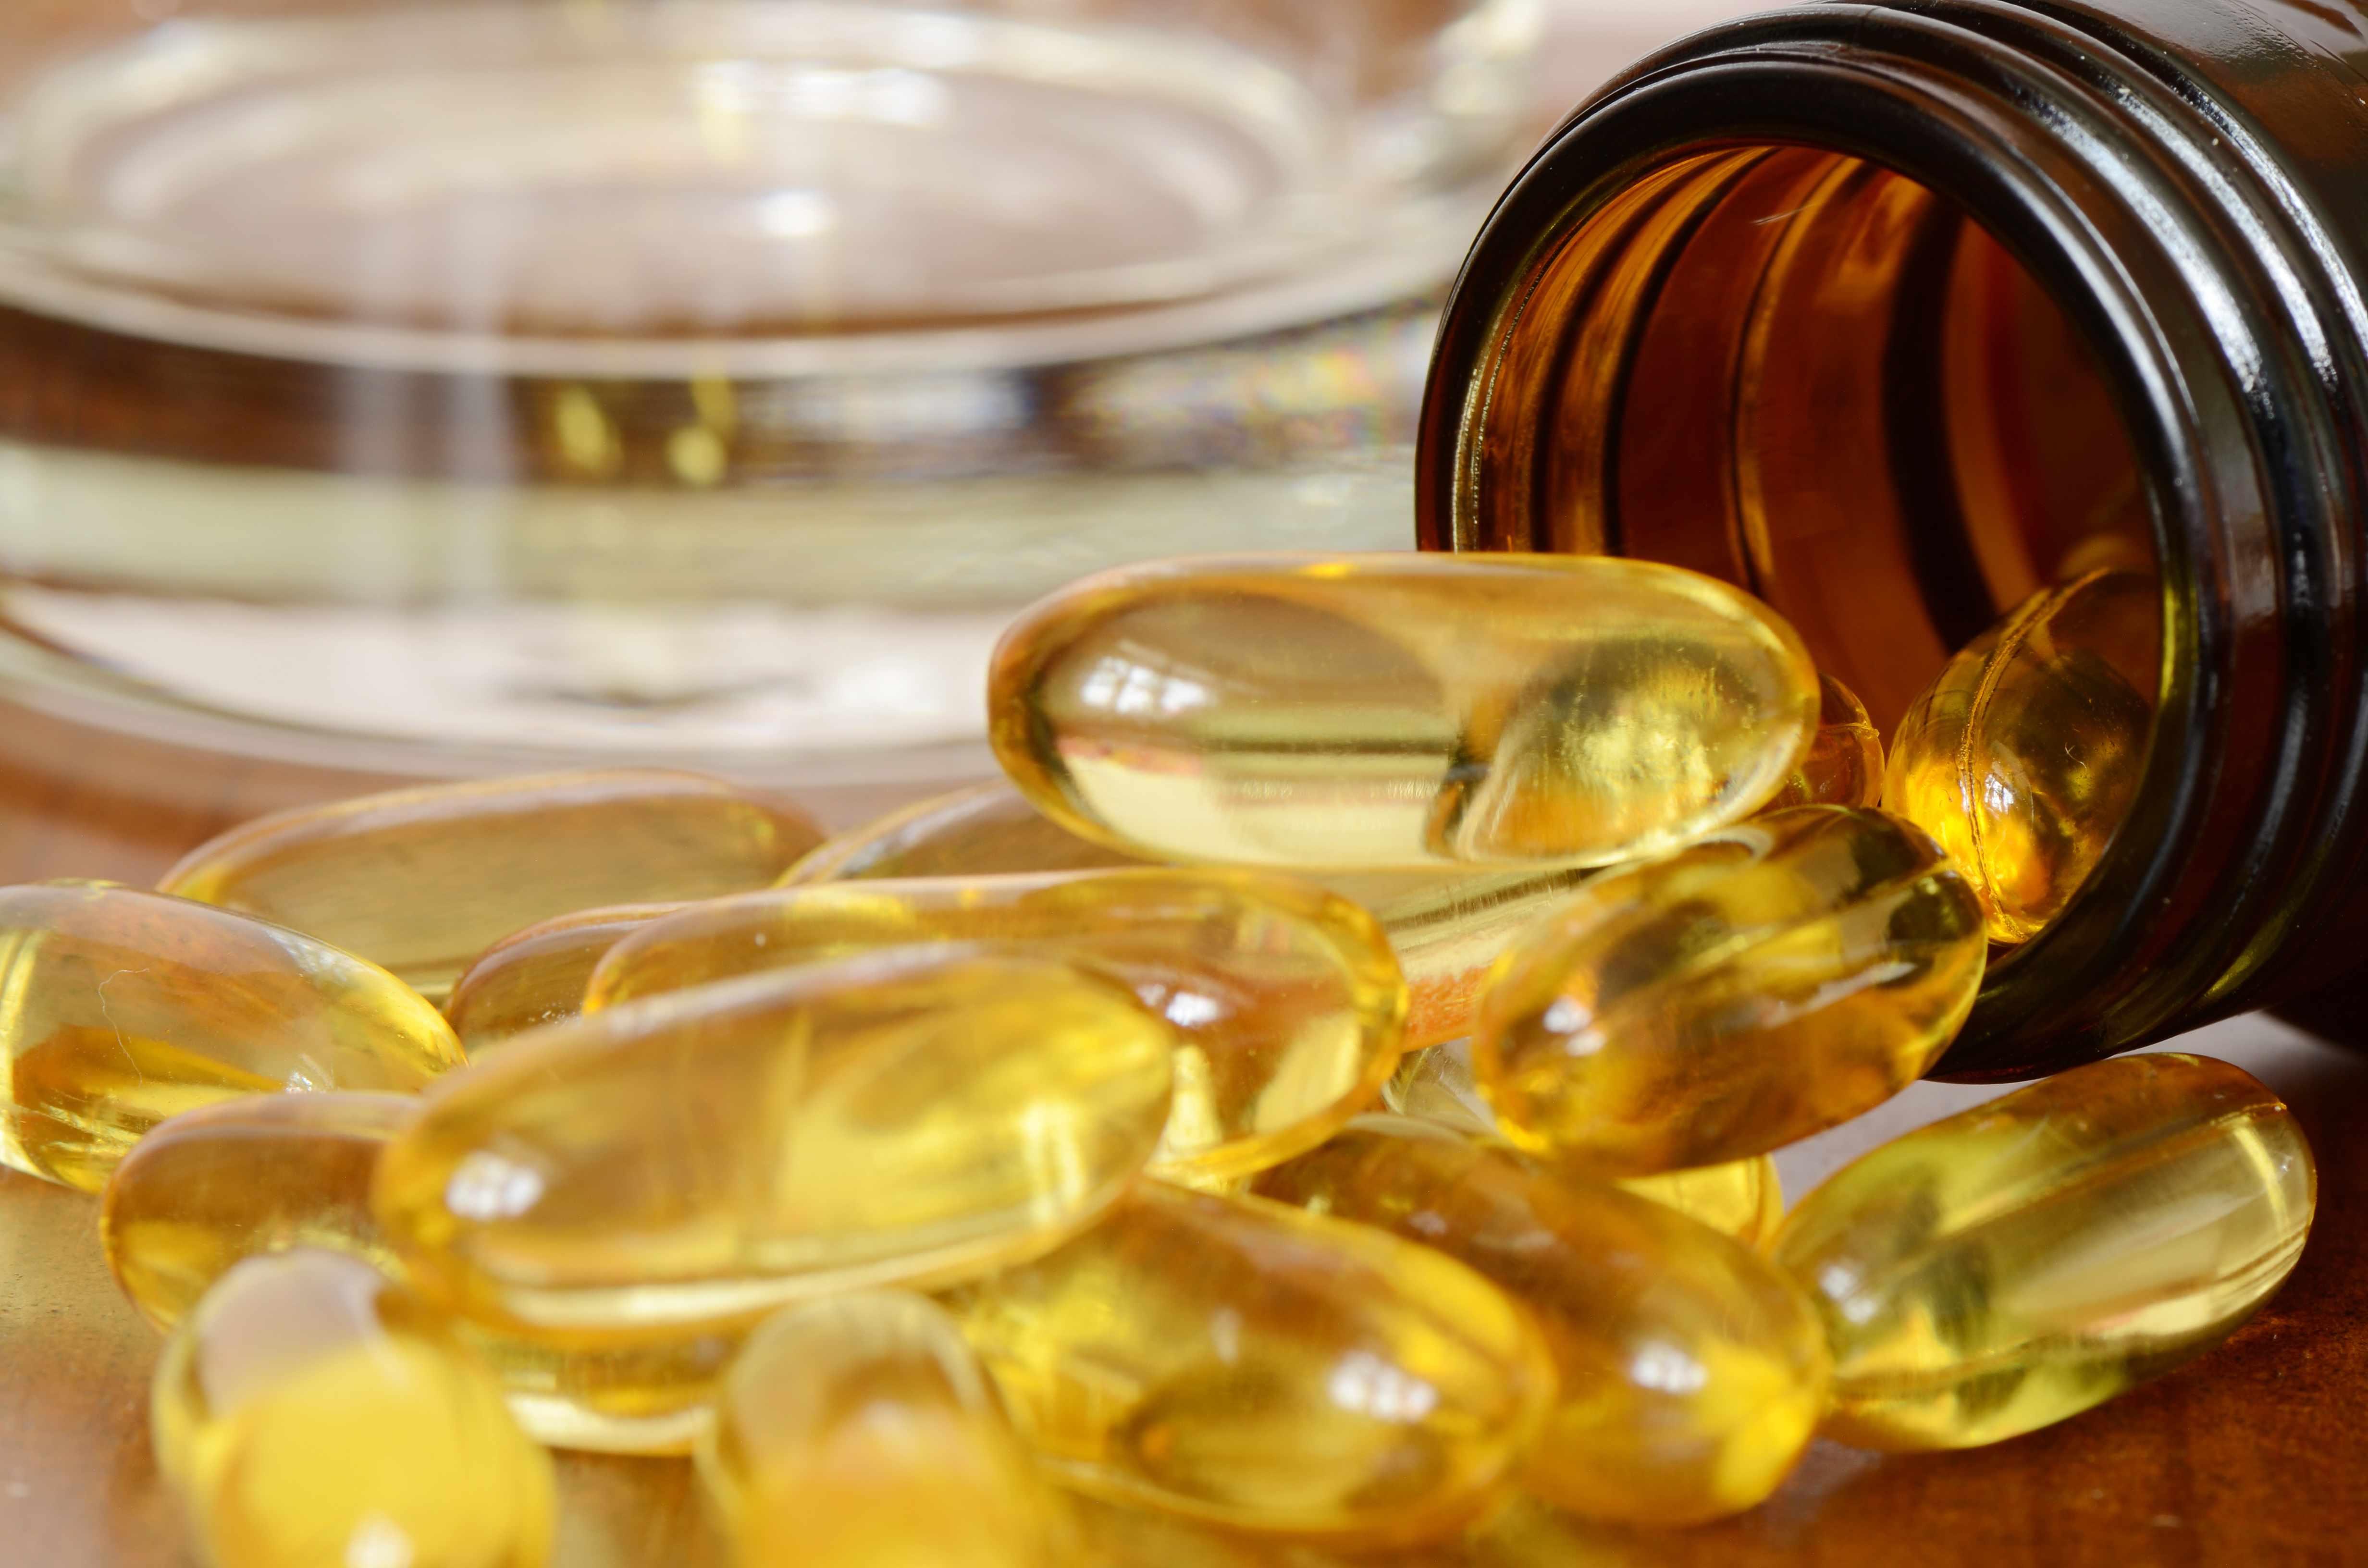 soft gelatin dietary supplement - Vitamin D capsule